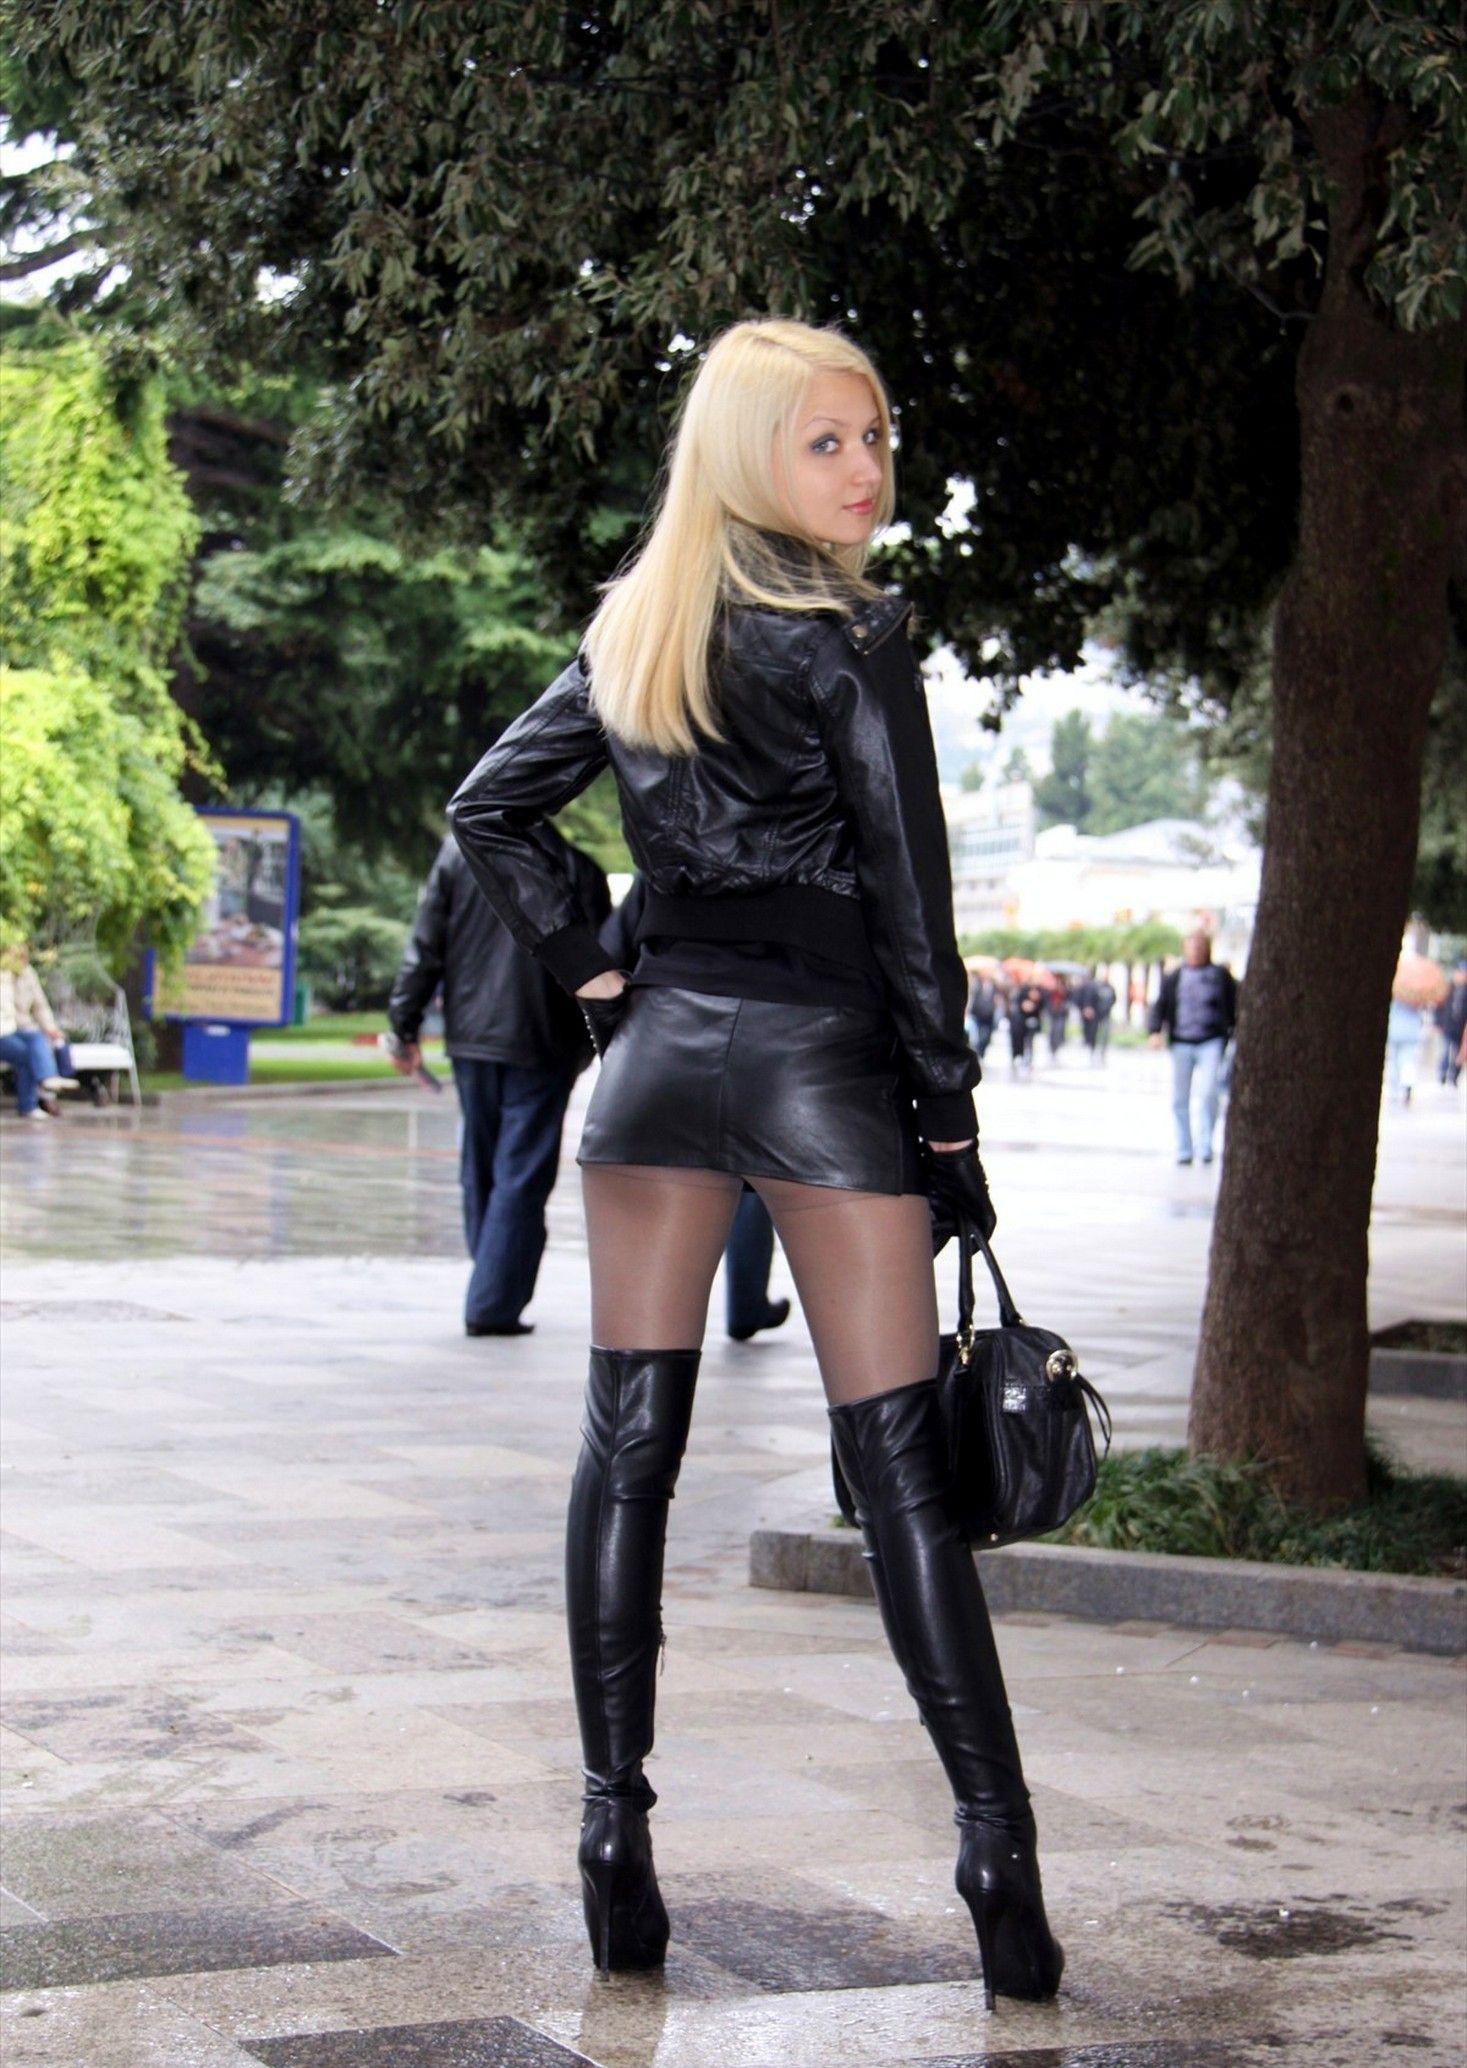 Transvestites in mini skirts